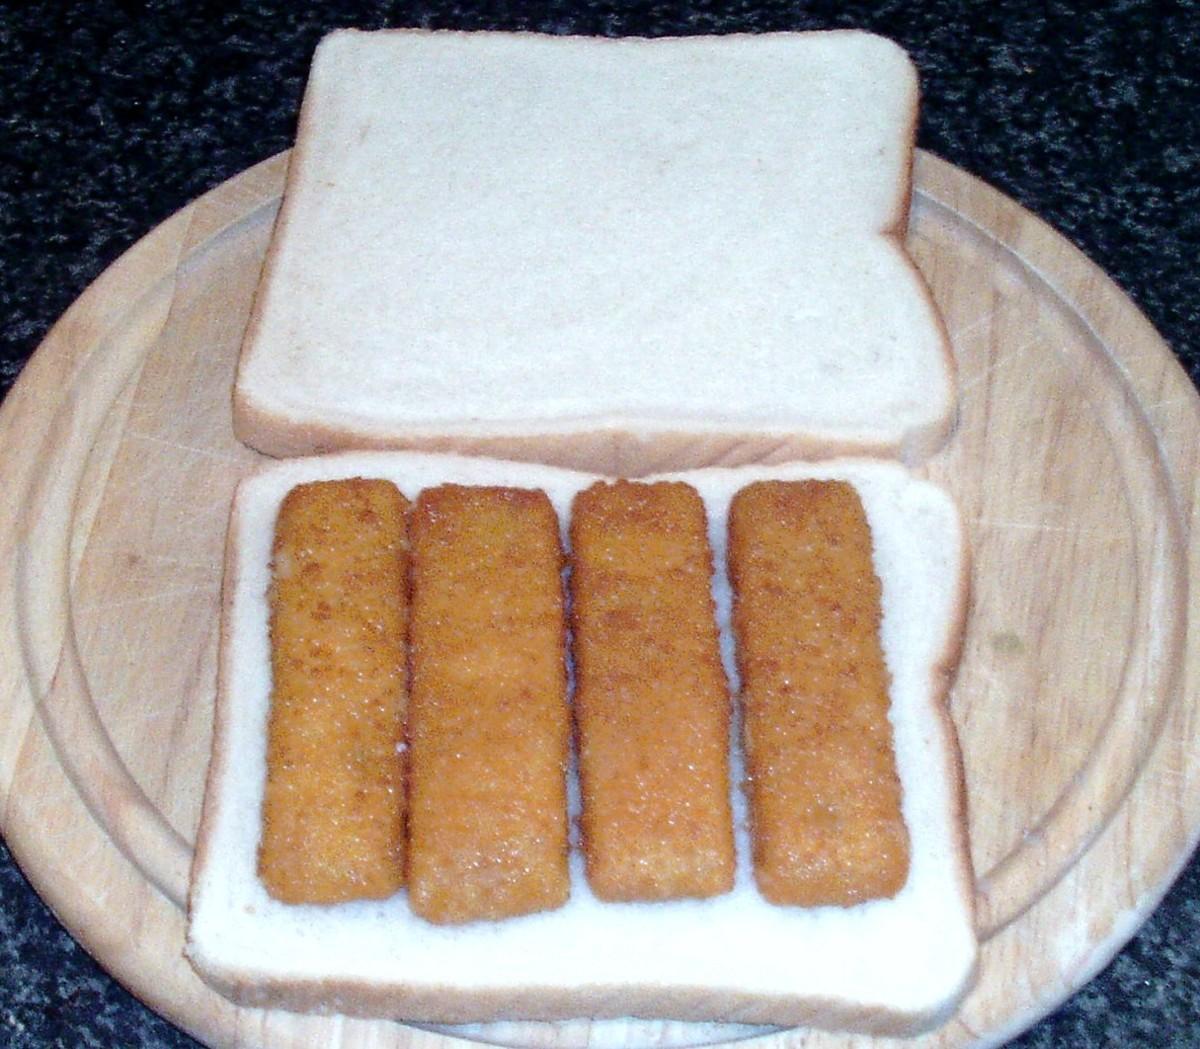 Fish fingers arranged on bread